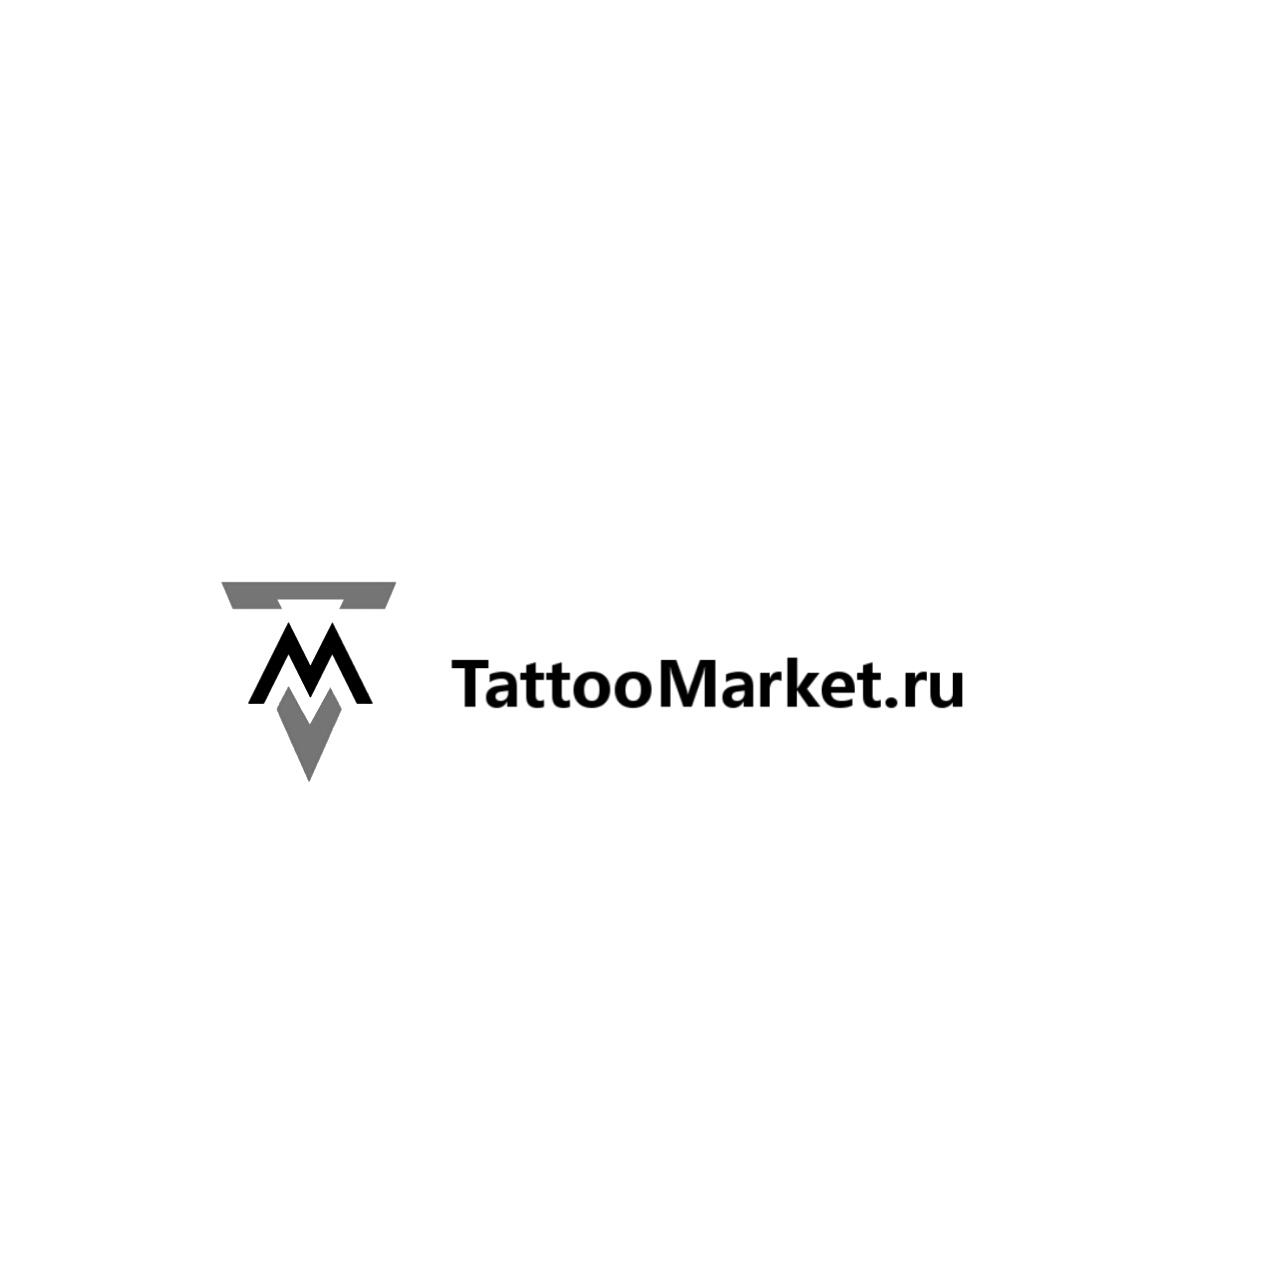 Редизайн логотипа магазина тату оборудования TattooMarket.ru фото f_6365c3cccac82871.jpg